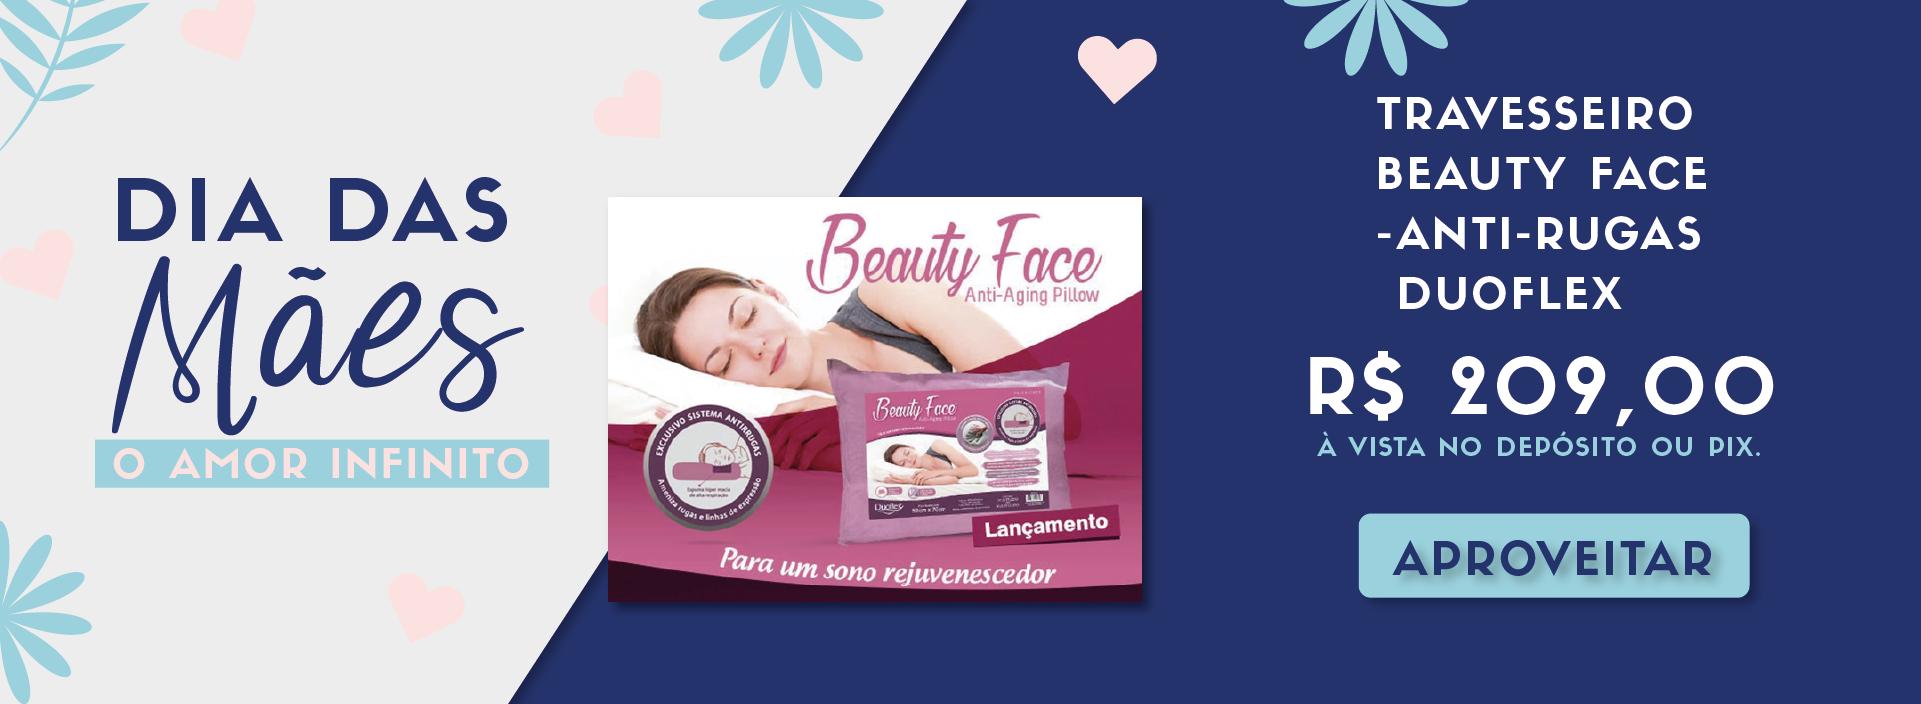 [MÃES] Travesseiro Beauty DESK